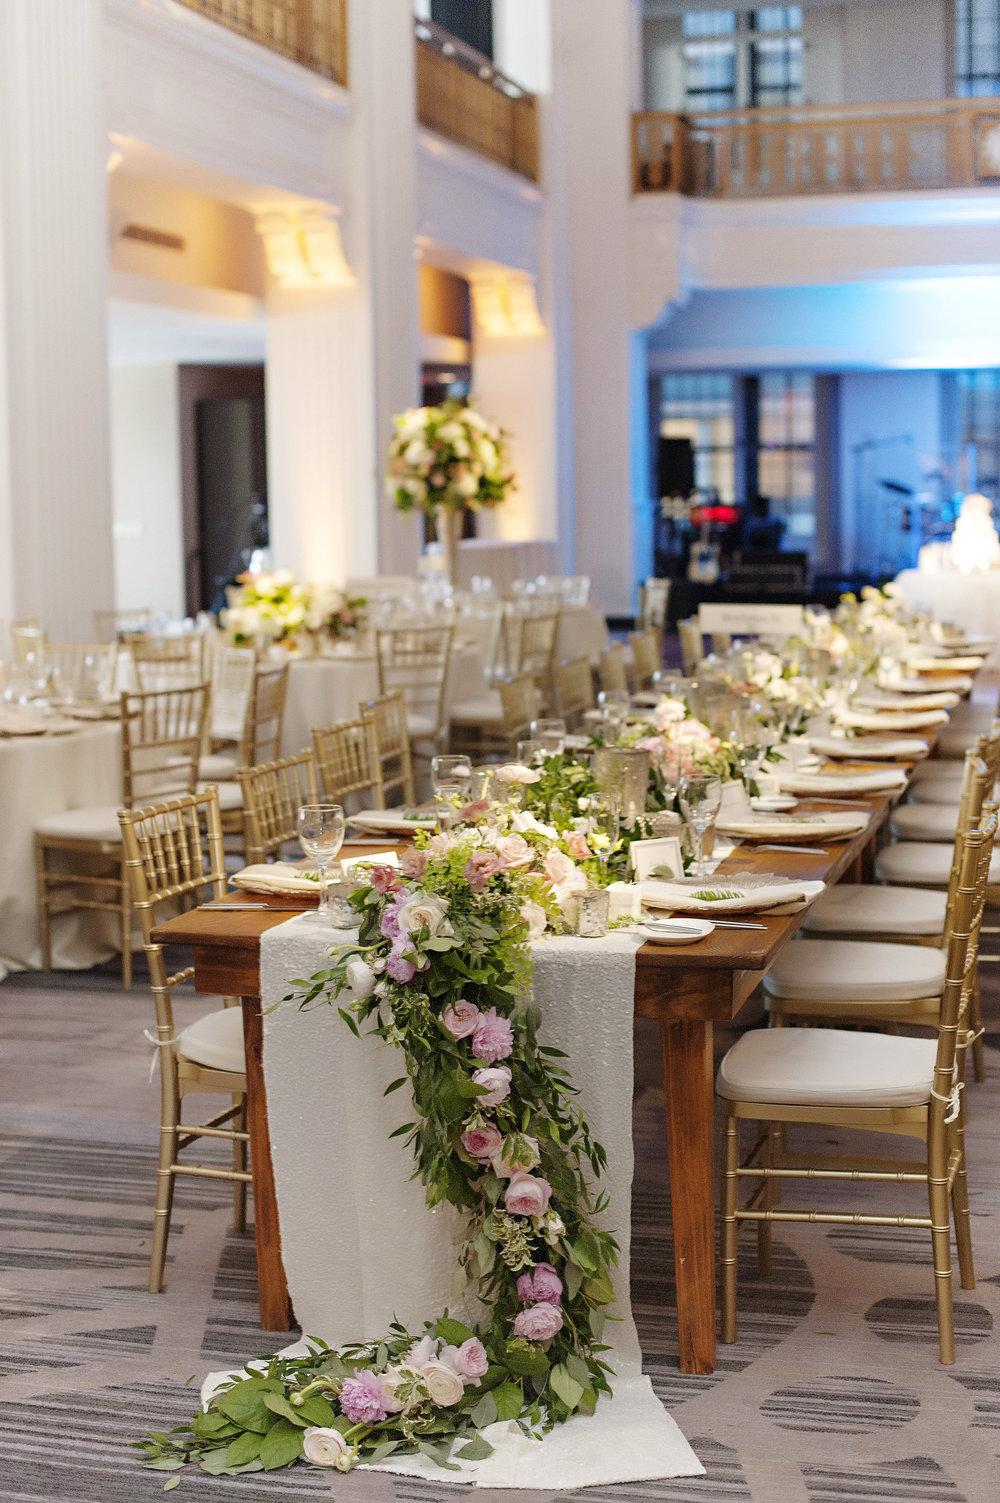 The Renaisssance Garden Theme Wedding